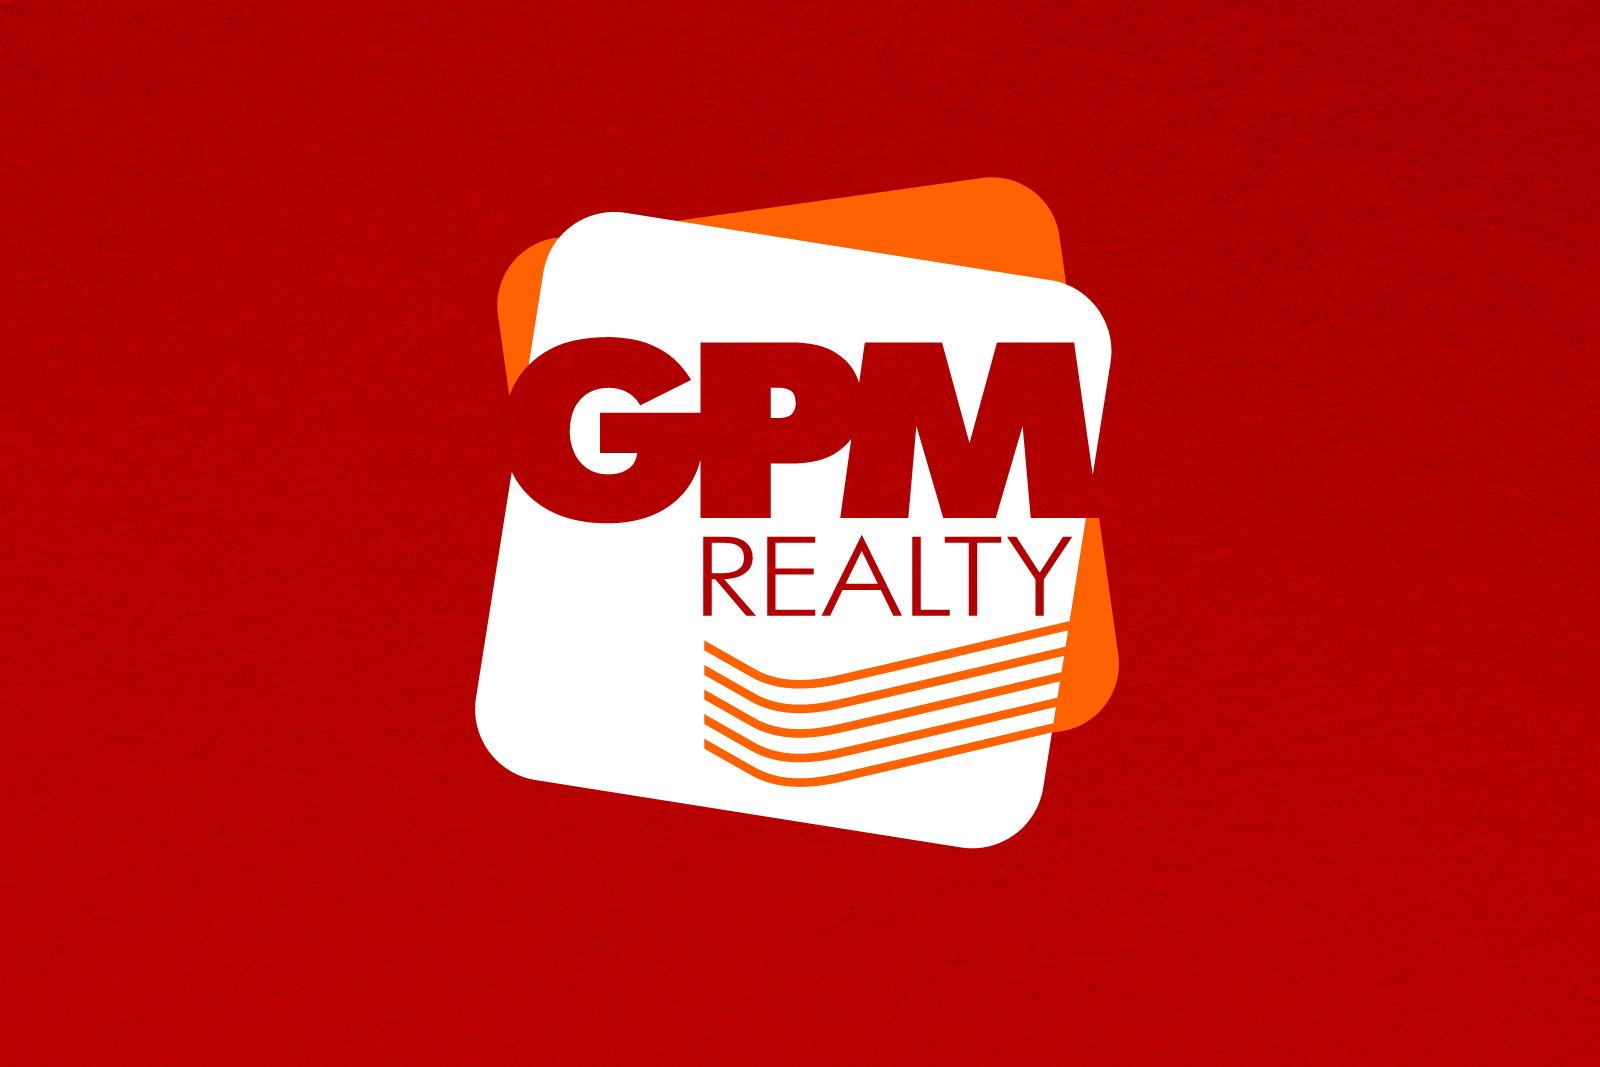 Асгард Брендинг, фирменный стиль, айдентика, лого, GPM Realty, дизайн, графический дизайн